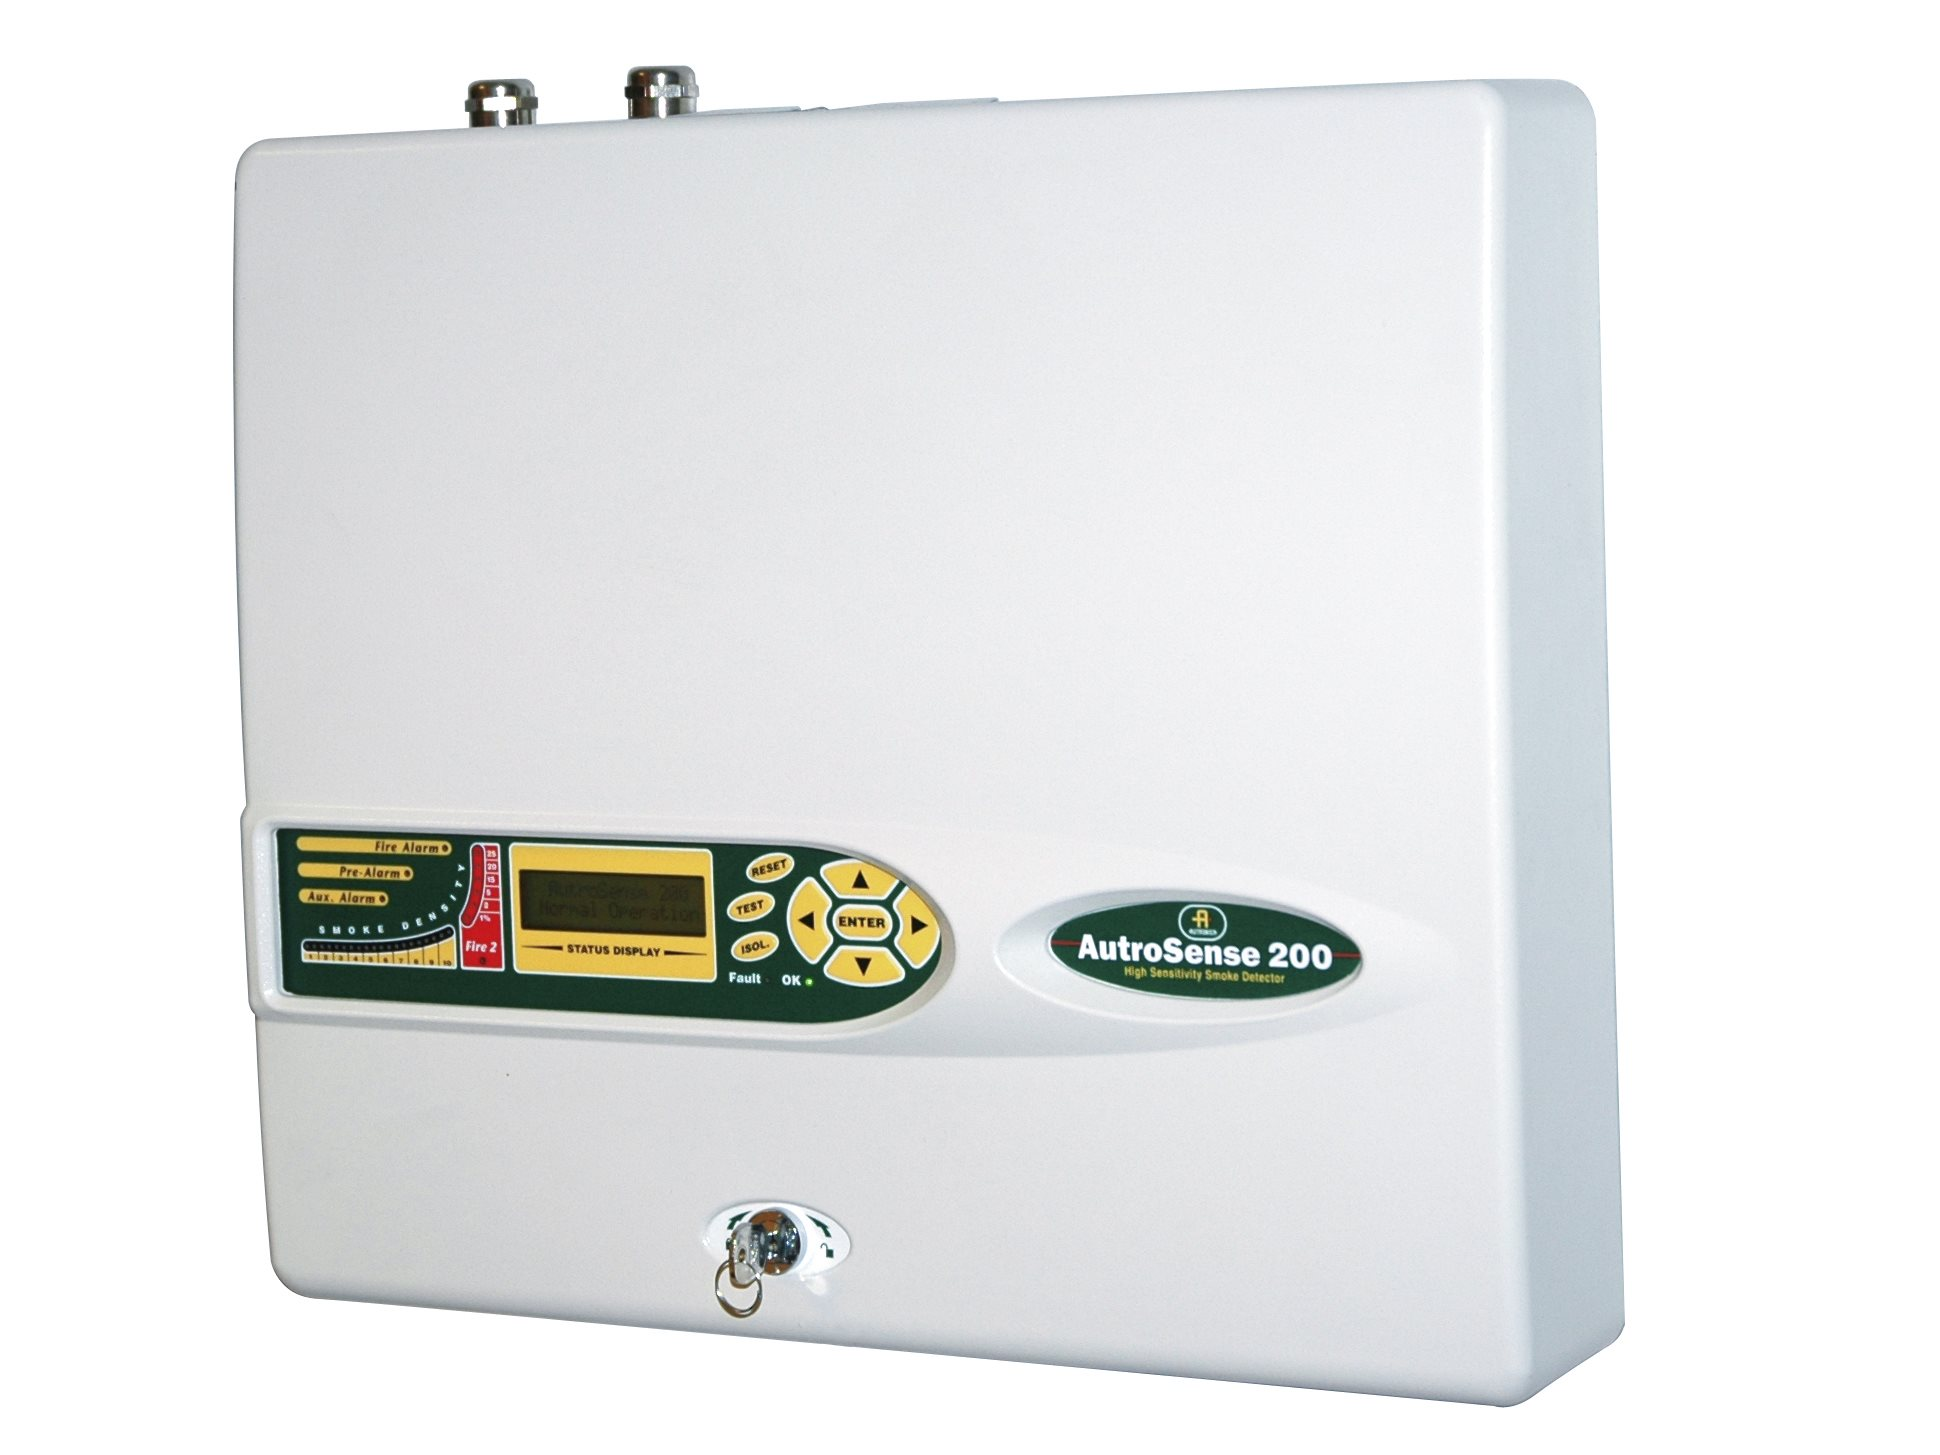 AutroSense 200